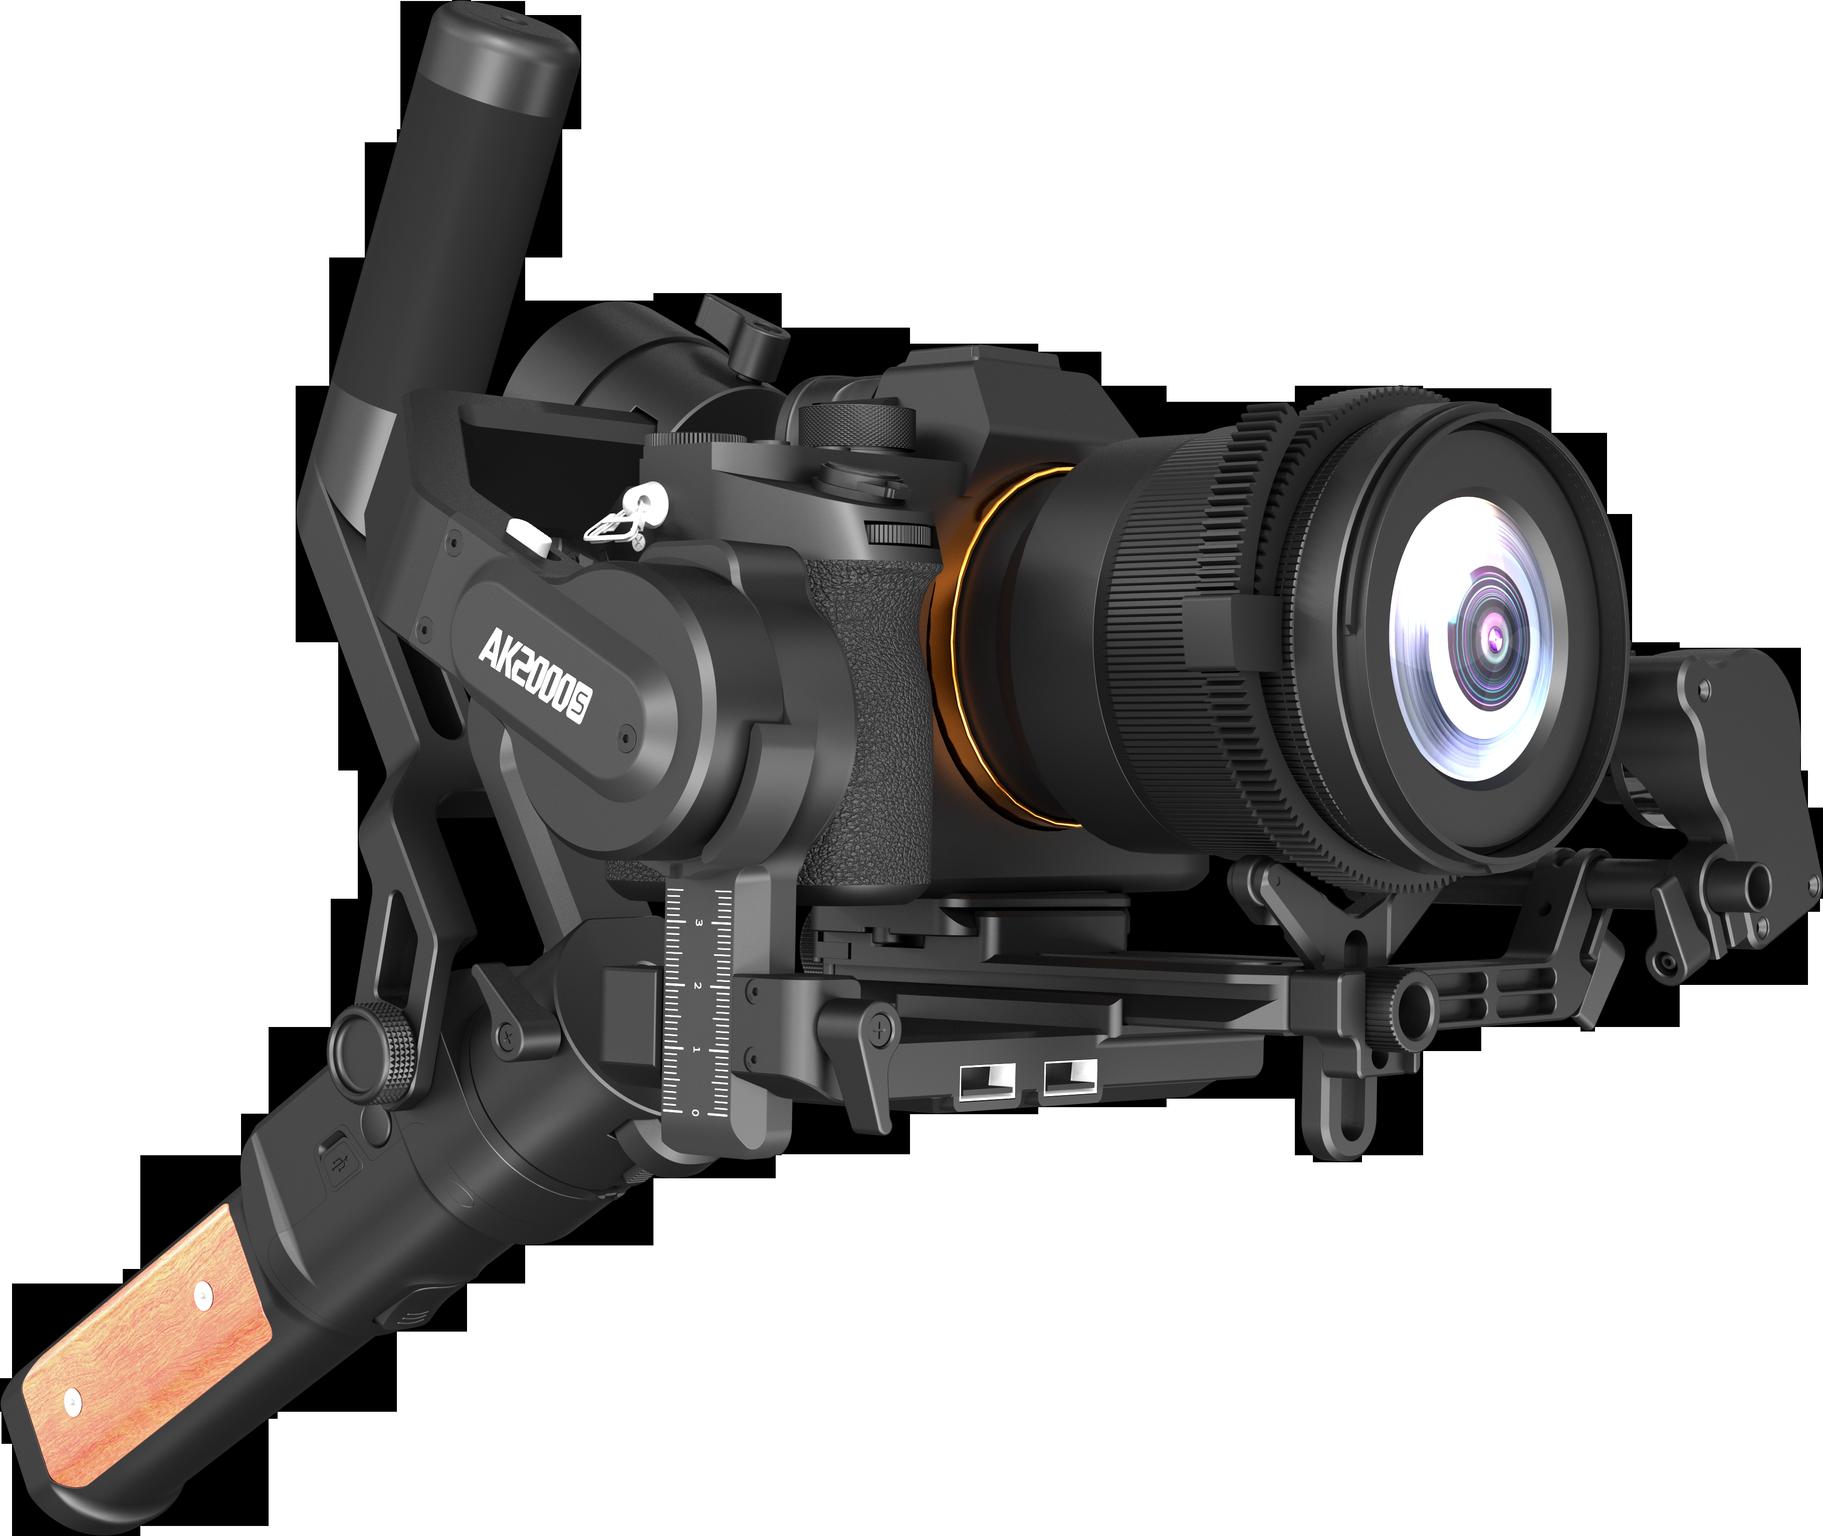 Feiyu AK2000 S 3 оси ручной карданный стабилизатор для sony Canon Panasonic Nikon беззеркальных и DSLR цифровой камеры Smart Touch